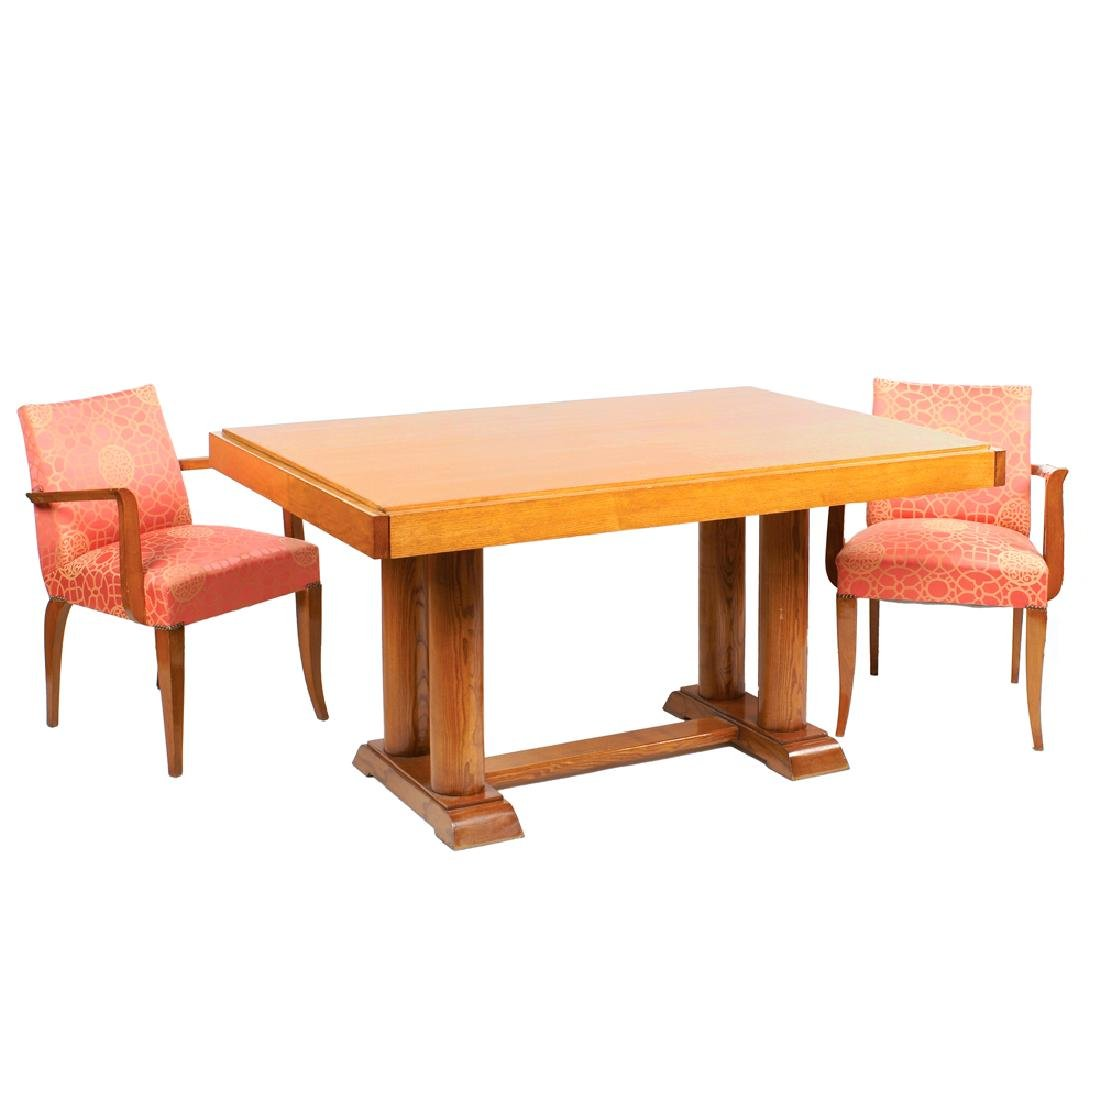 A Decò ashwood extendible table France 20th century